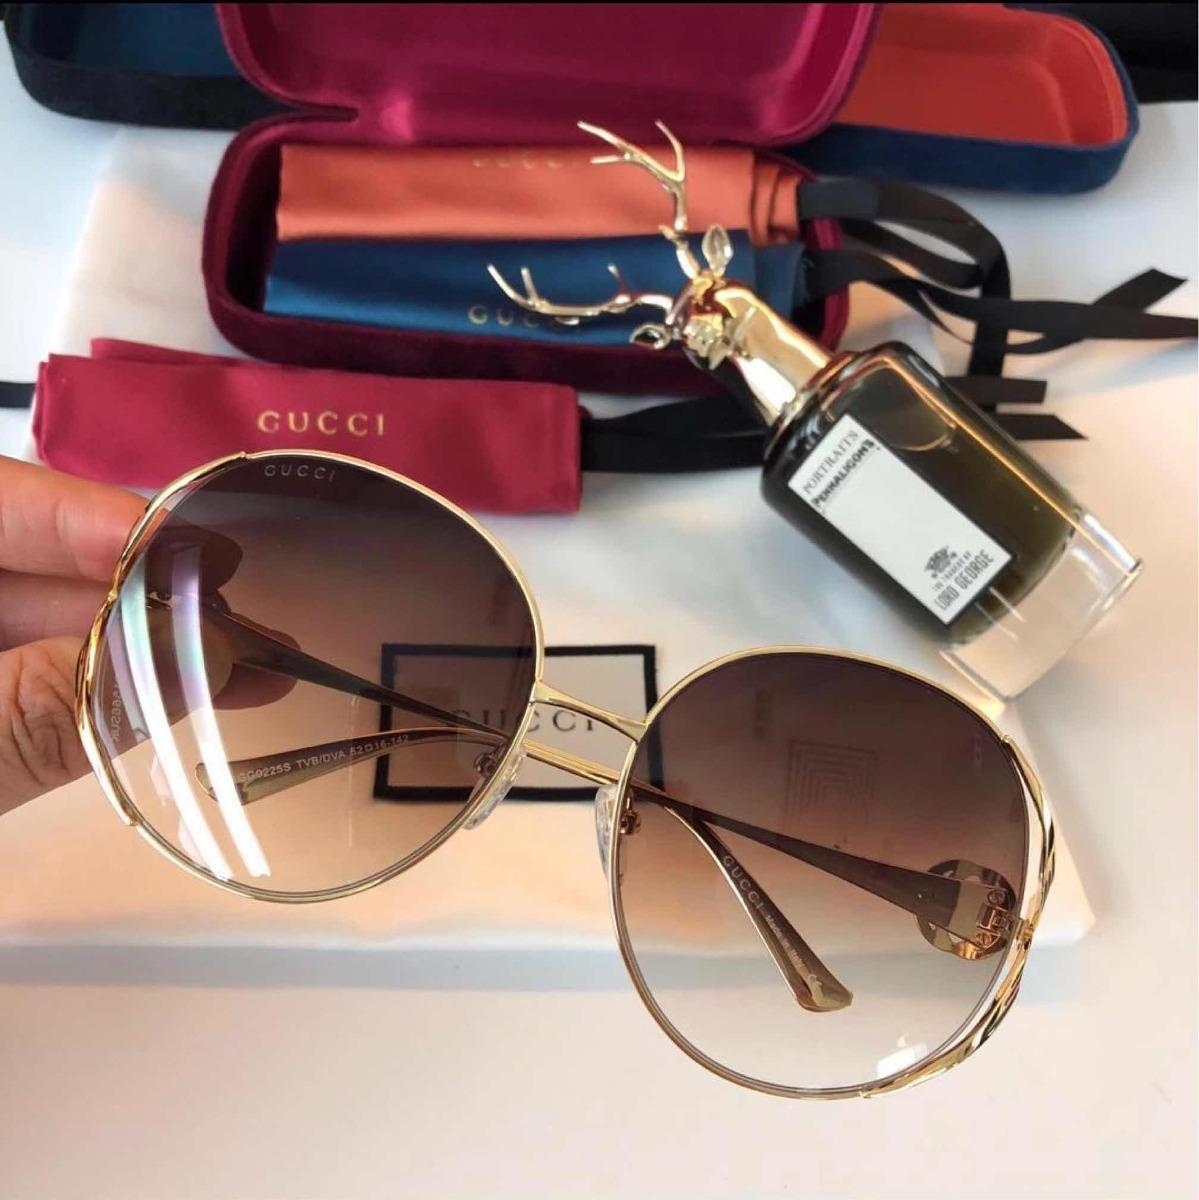 68741a550c019 Óculos De Sol Feminino Gucci Quadrado Redondo Acetato - R  449